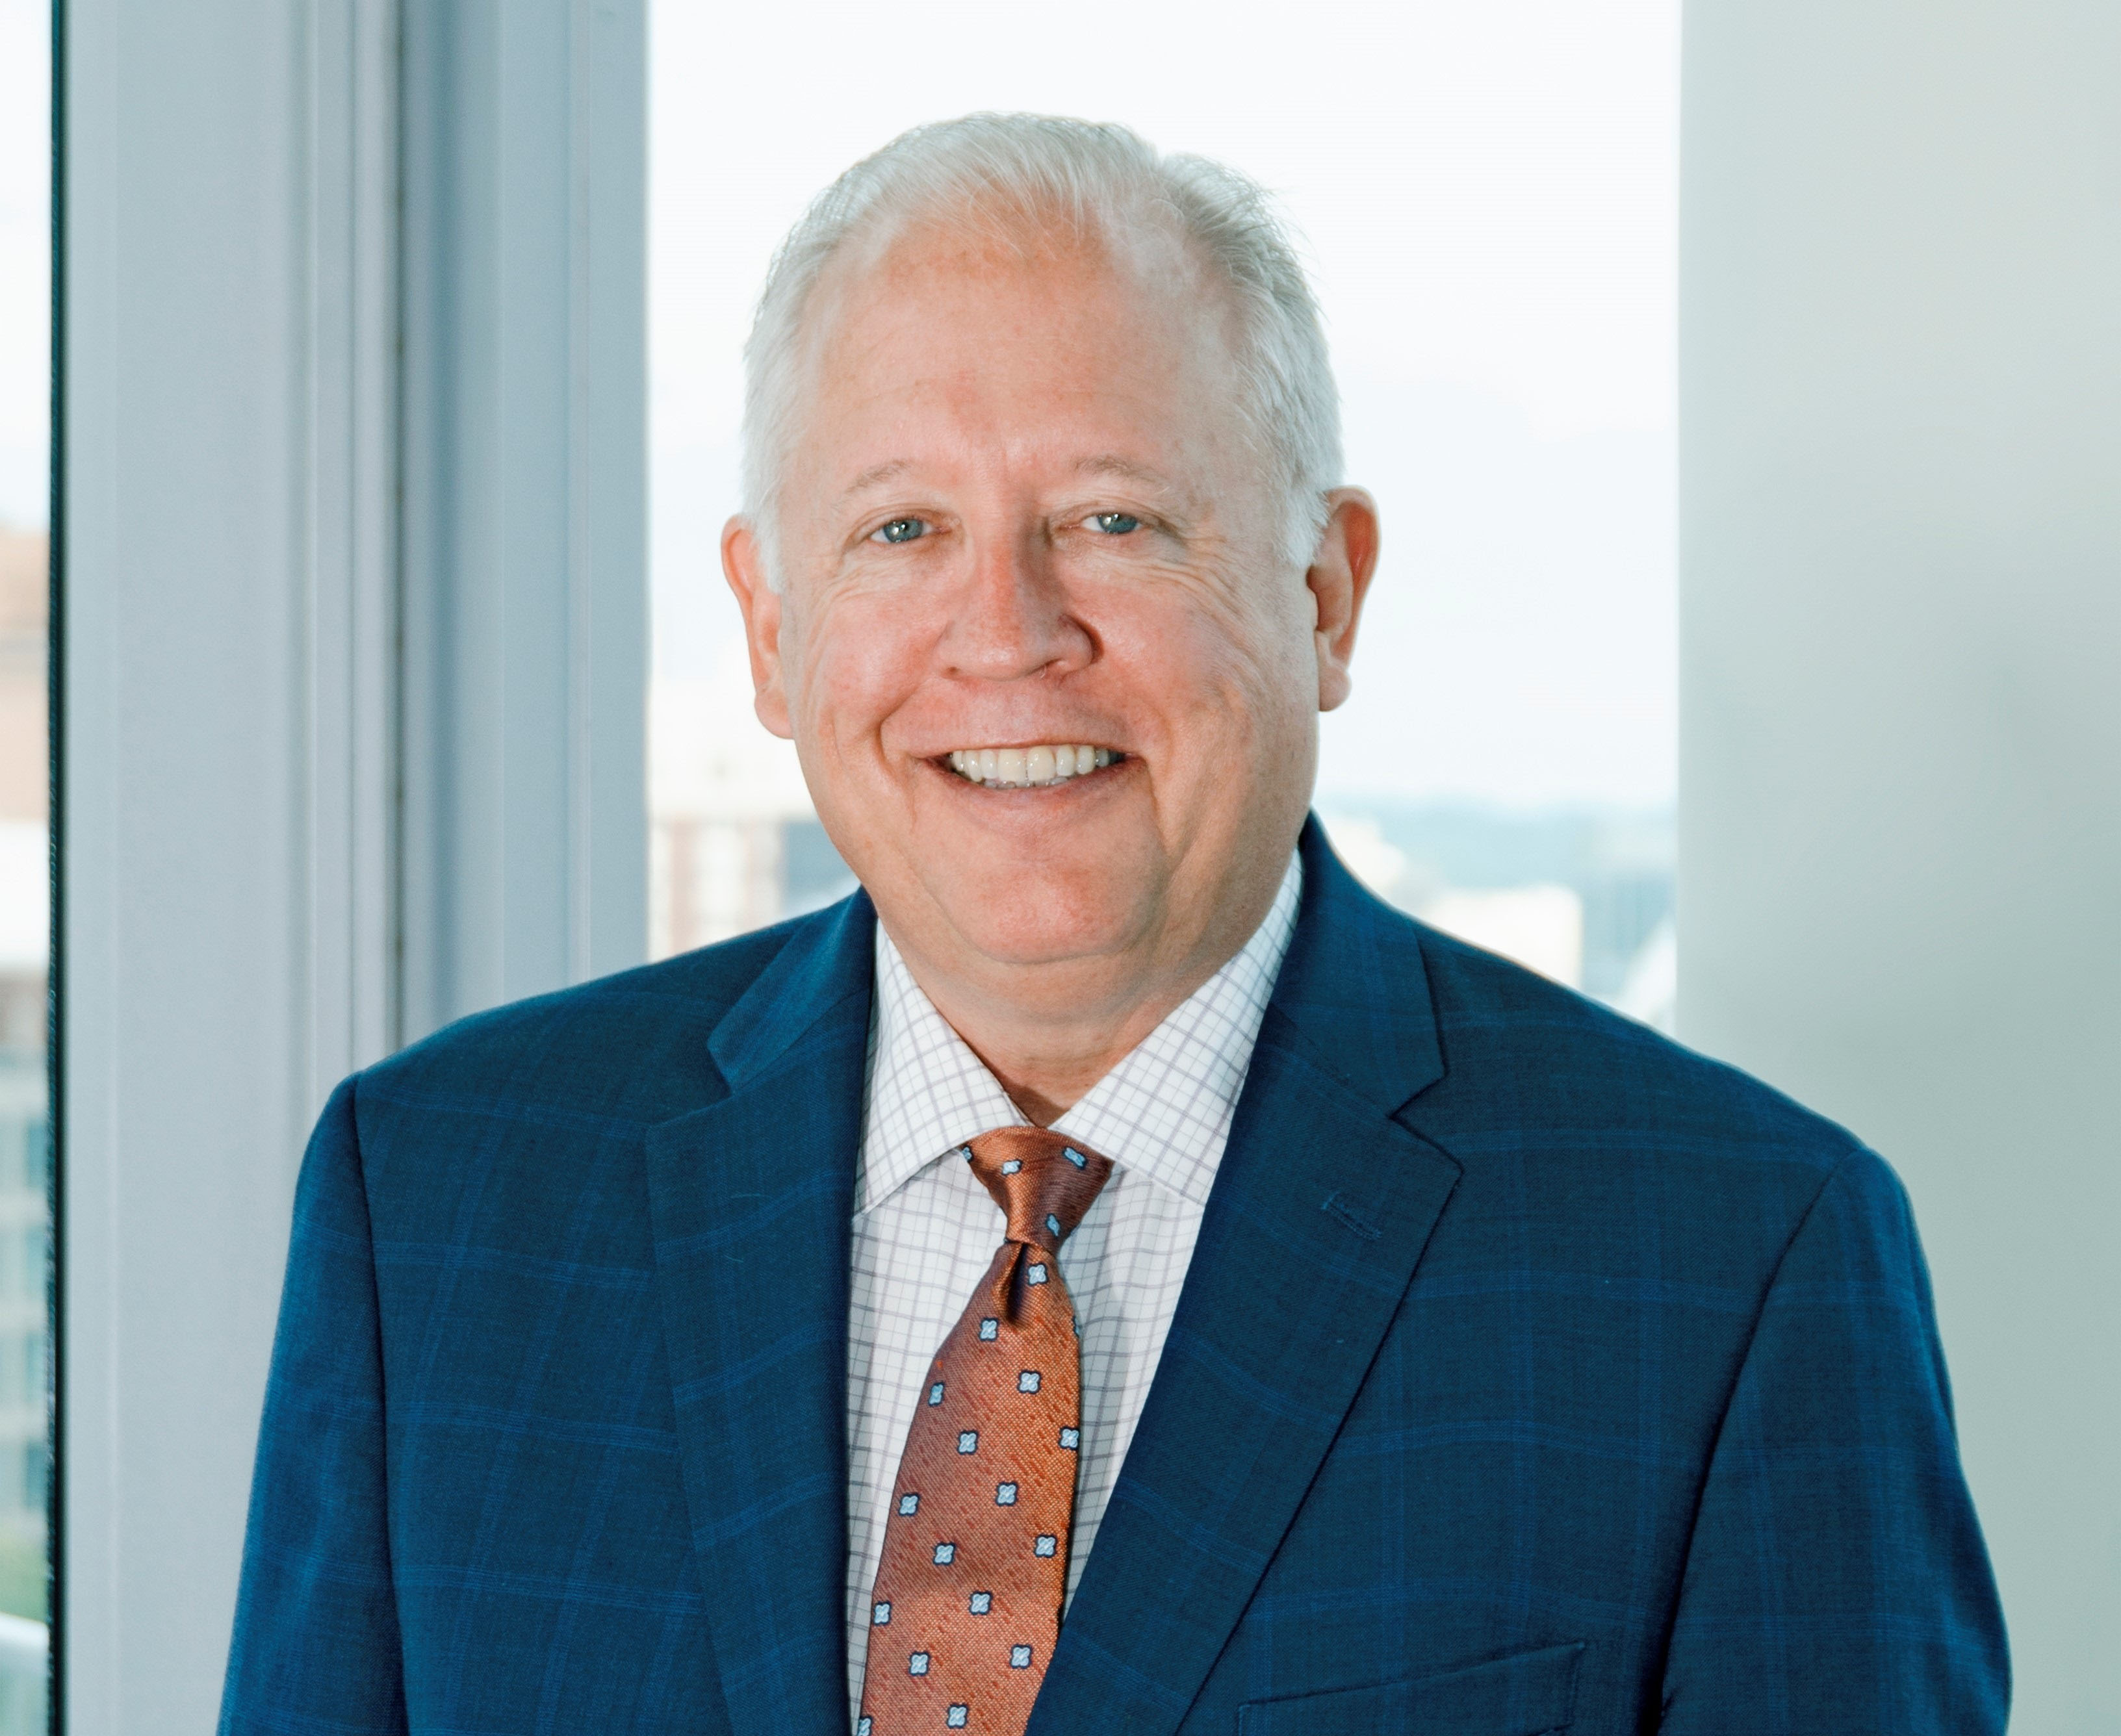 Ambassador Thomas A. Shannon, Jr. | Freedom House